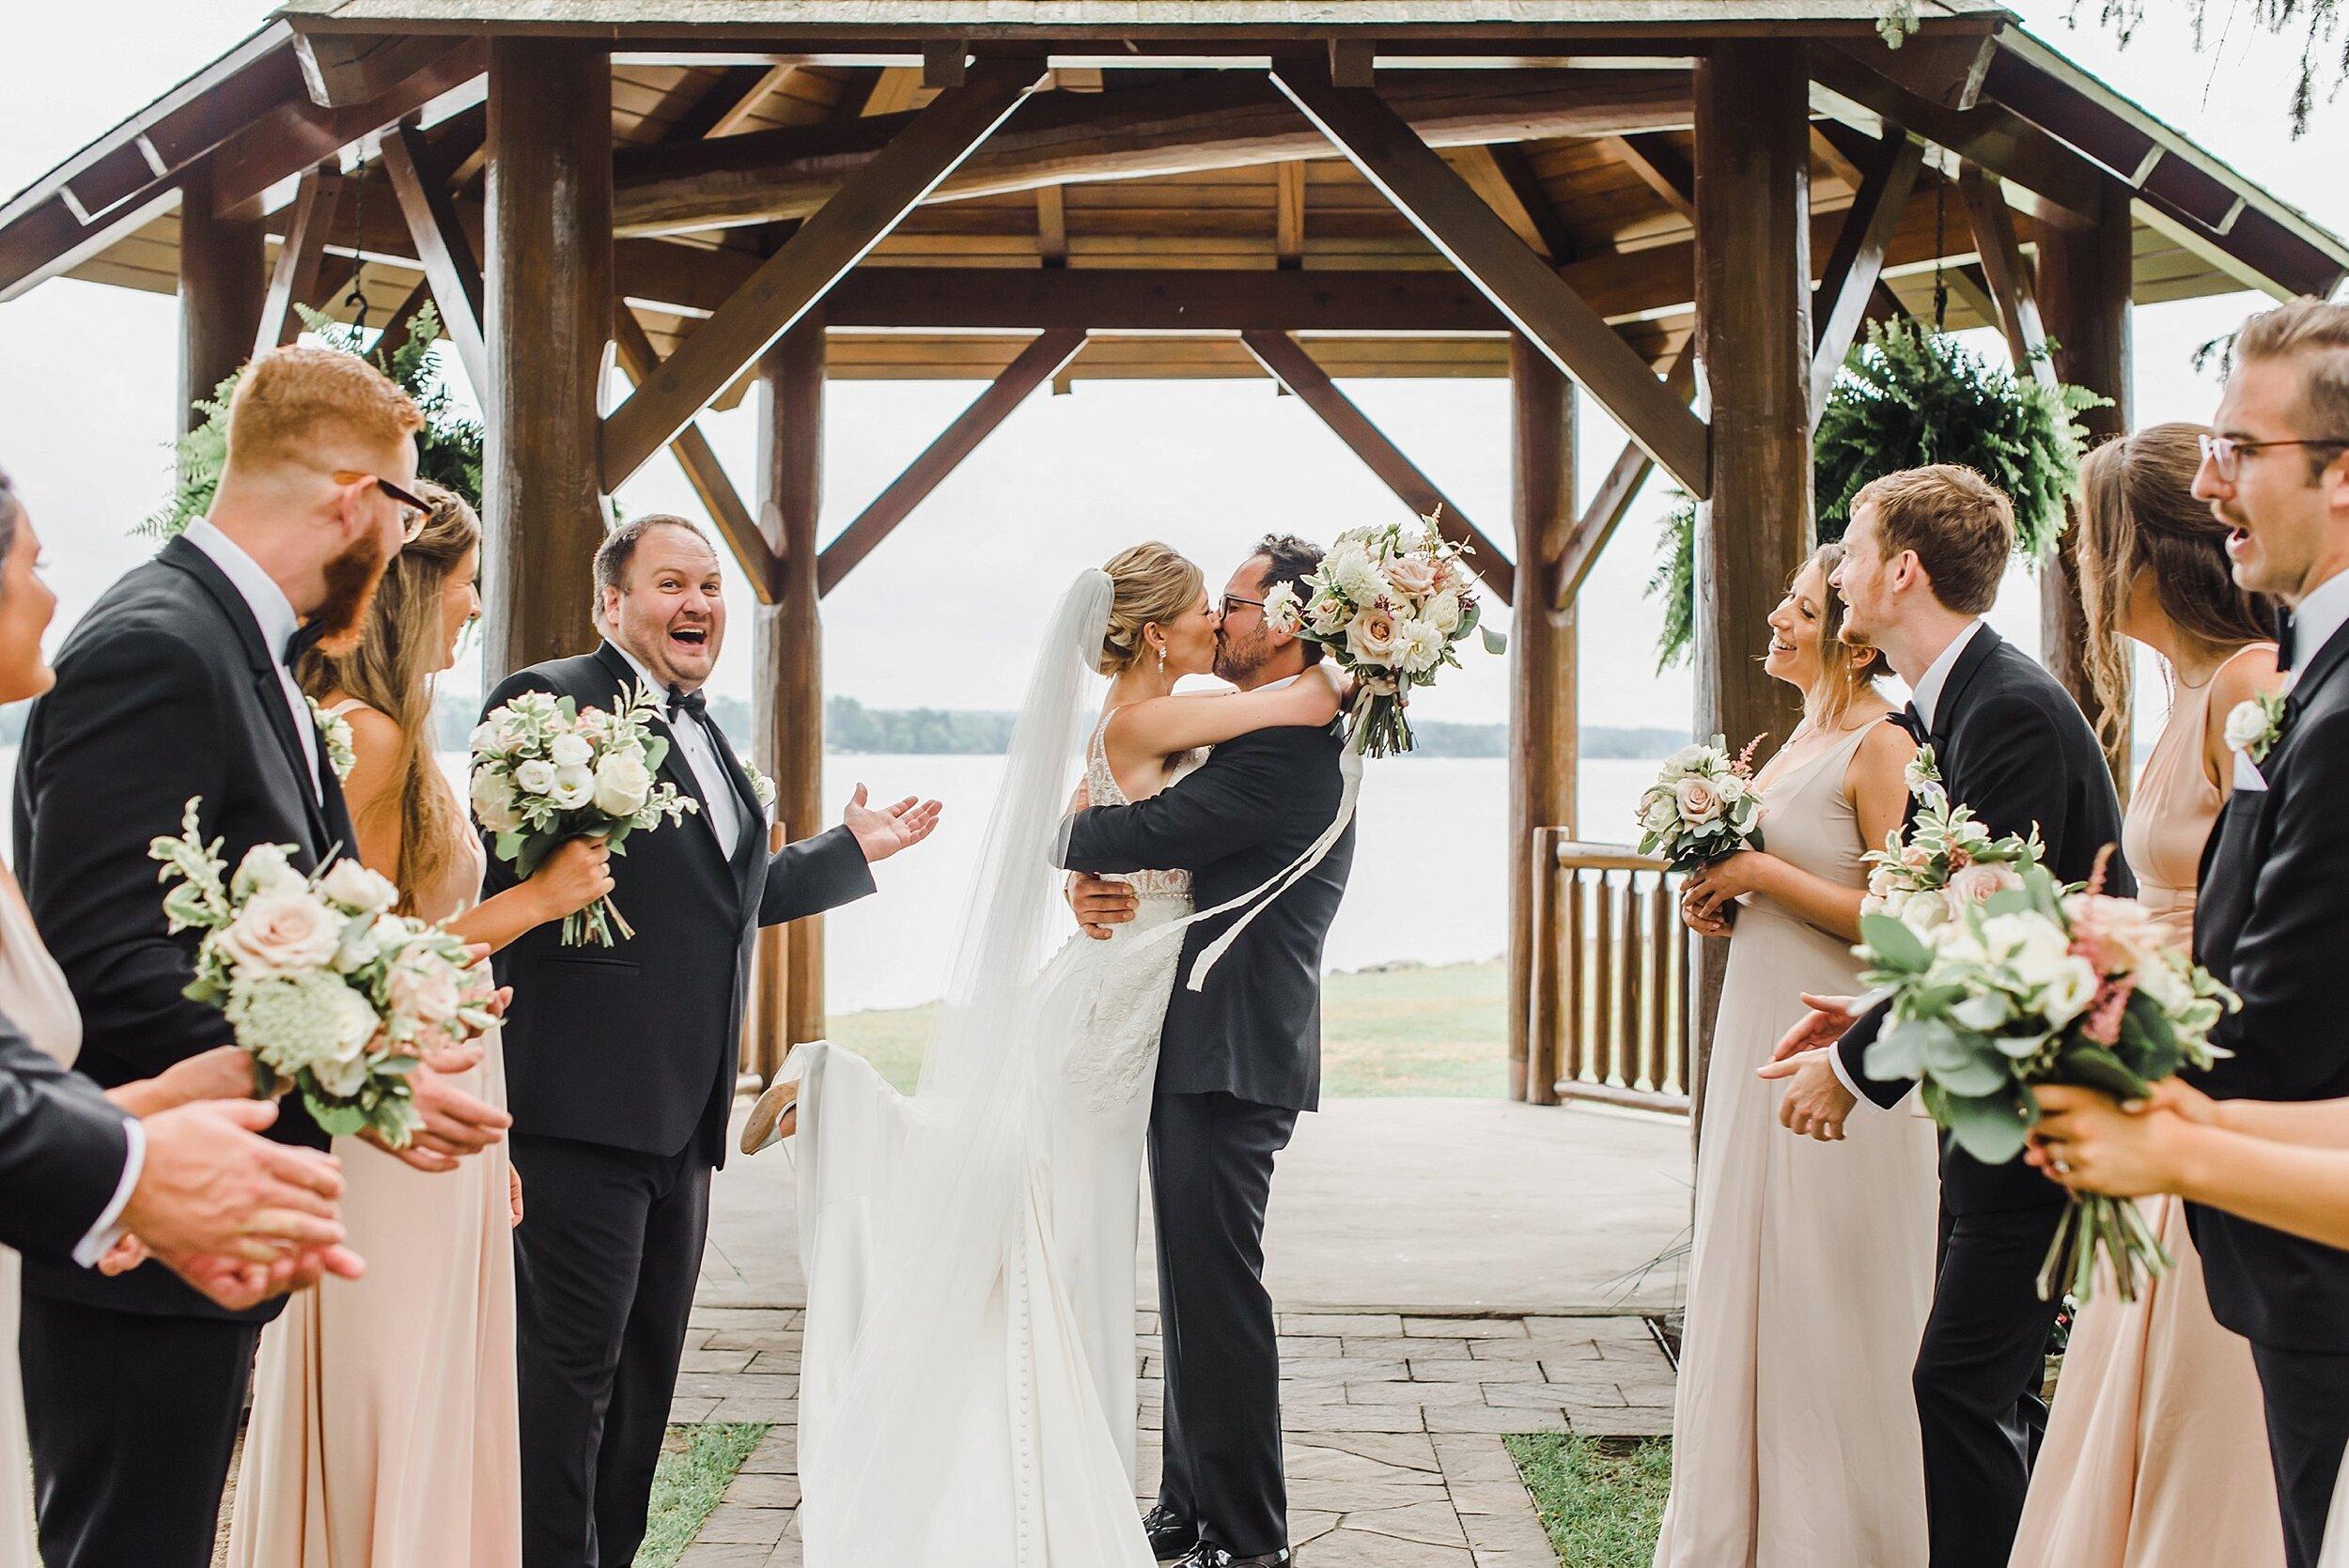 light airy fine art ottawa wedding photographer | Ali and Batoul Photography | Fairmont Le Chateau Montebello43.jpg